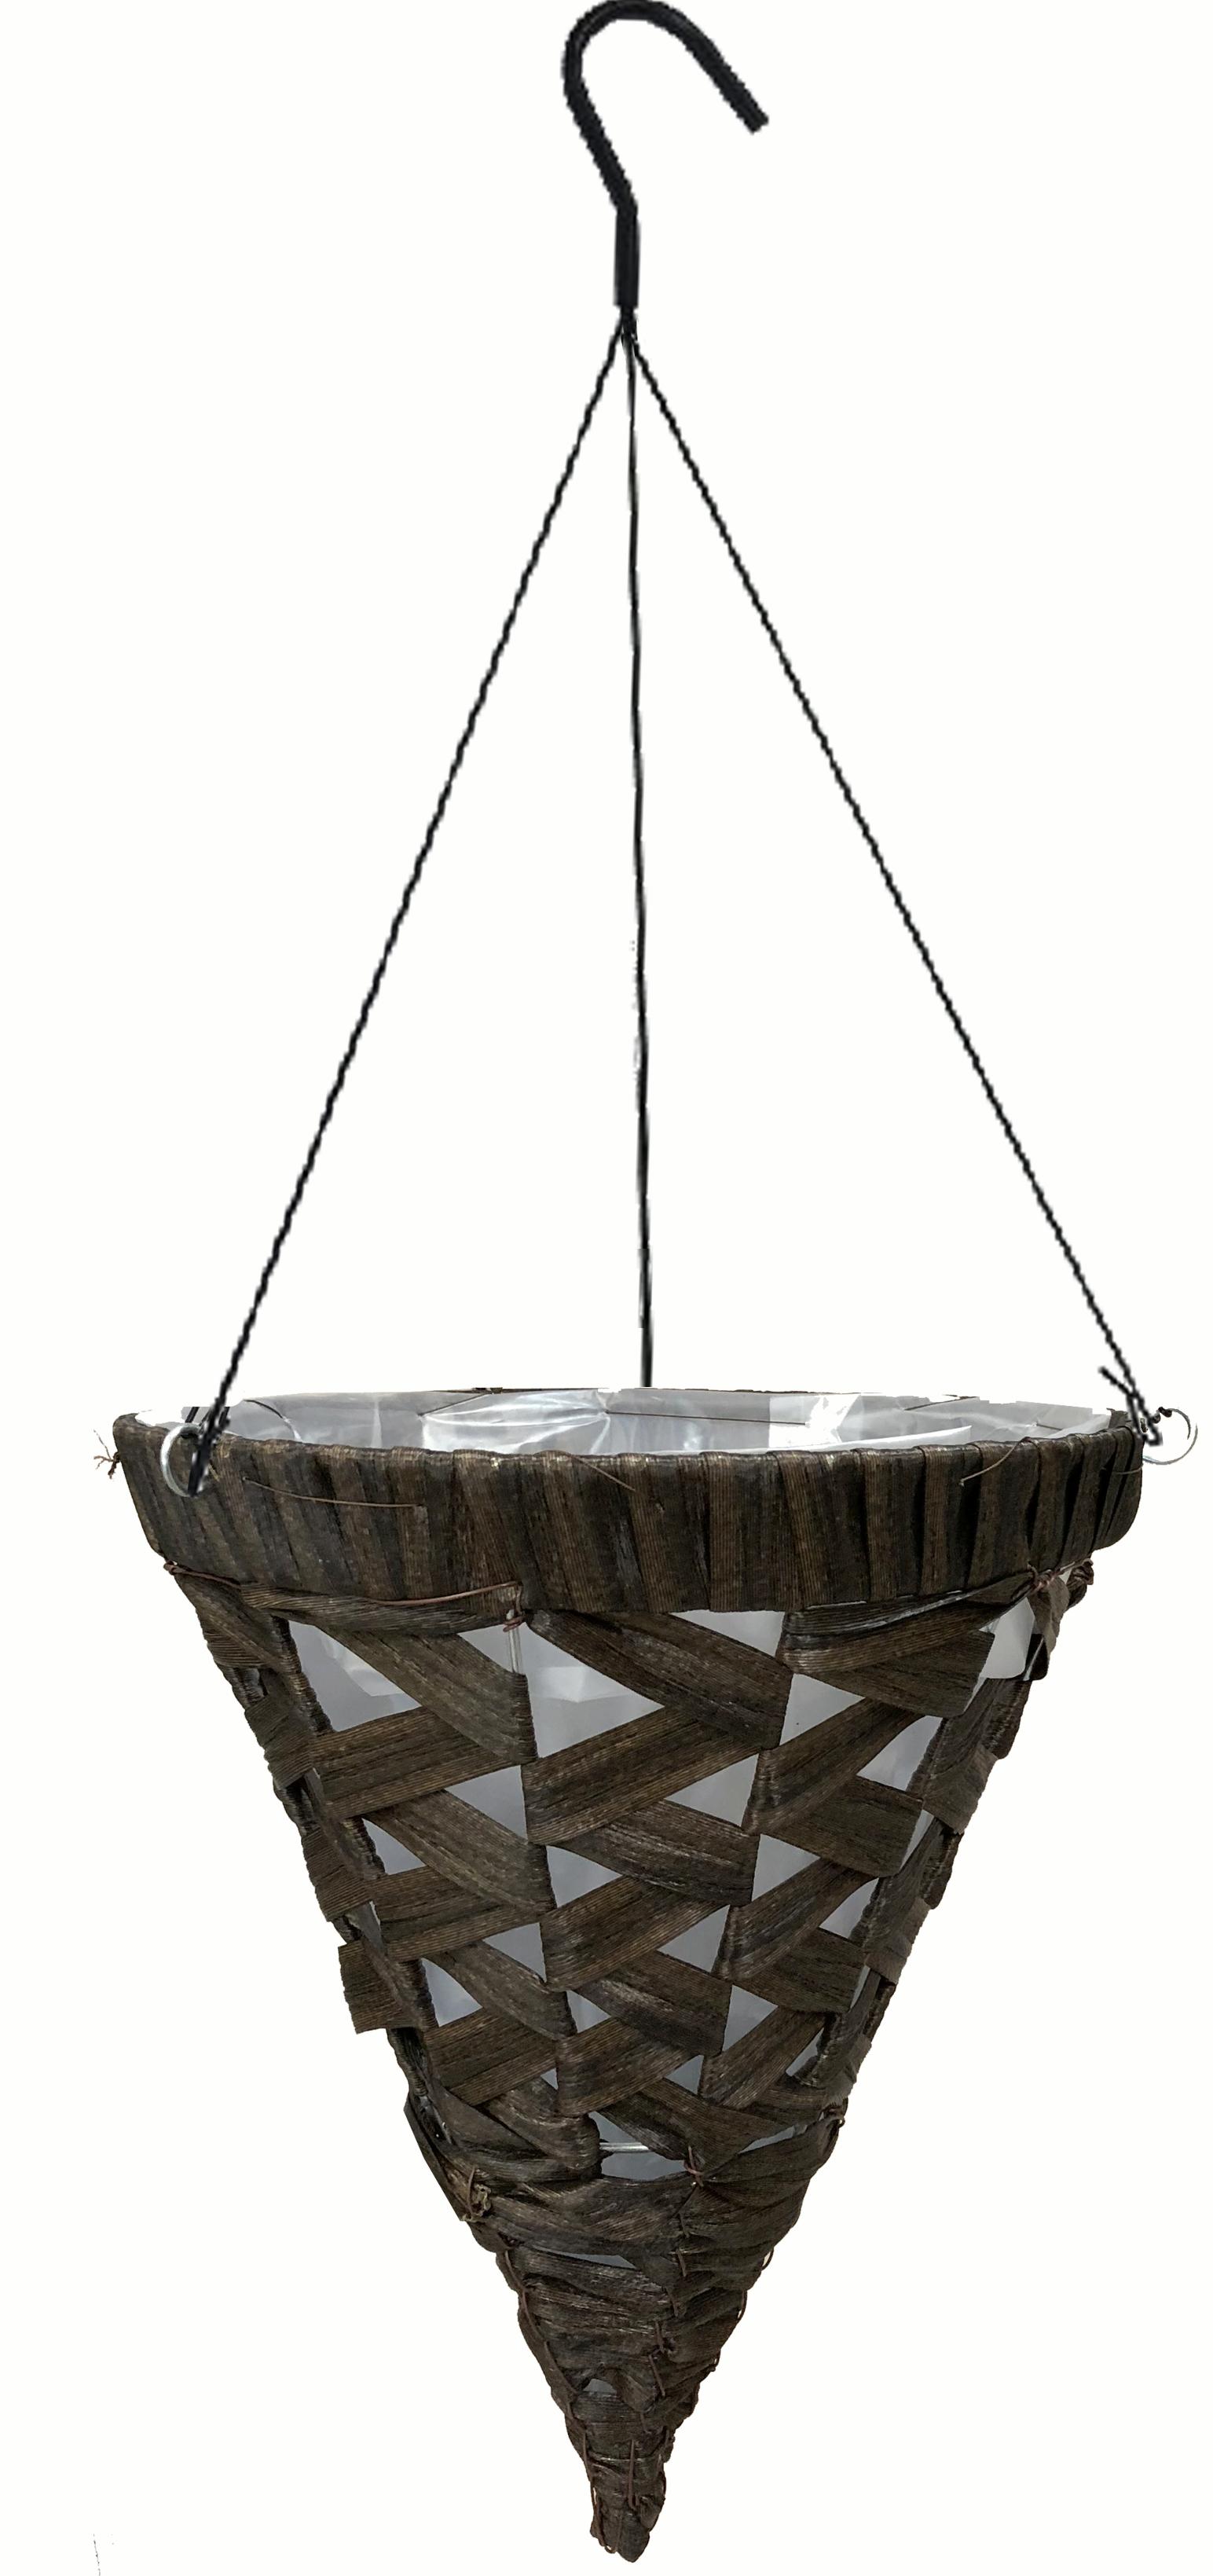 black coffe wicker cone with wire hager.jpg